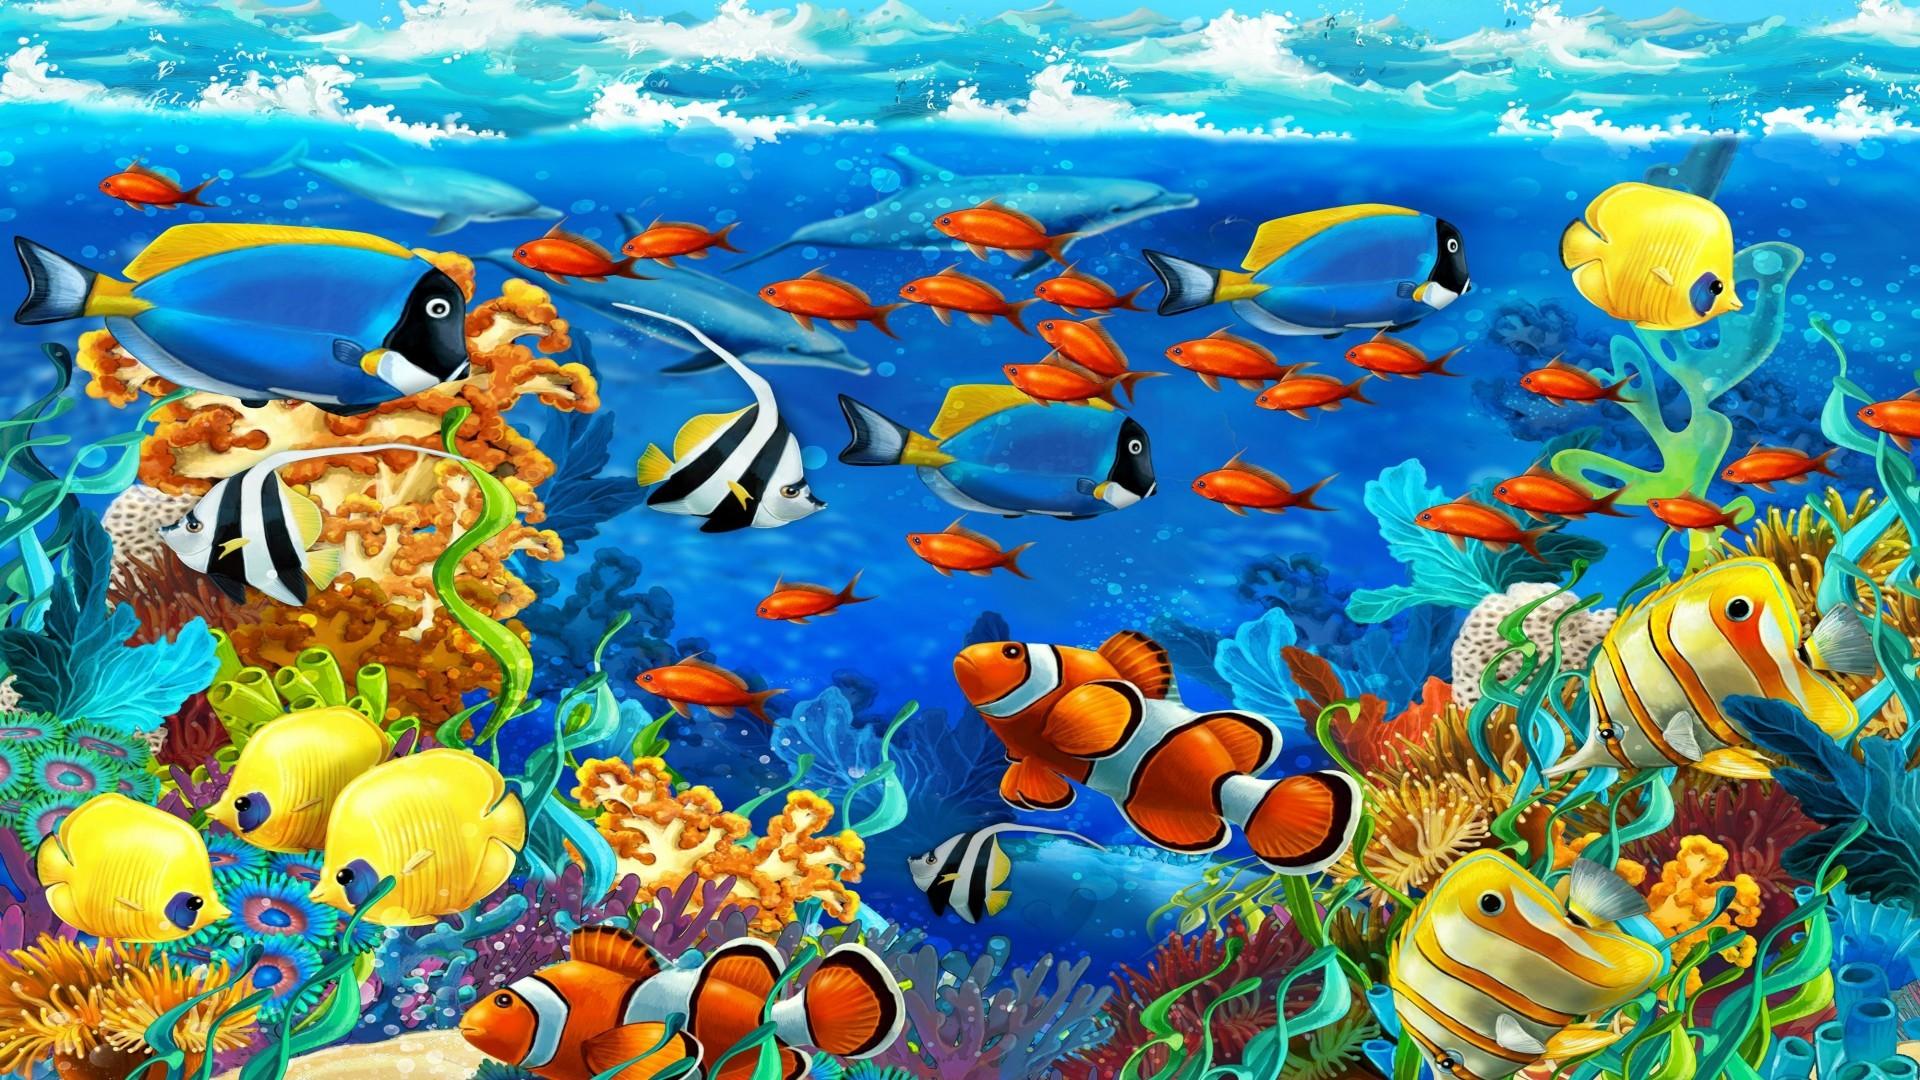 Koi Fish 3d Animated Wallpaper Tropical Fish Backgrounds 183 ① Wallpapertag